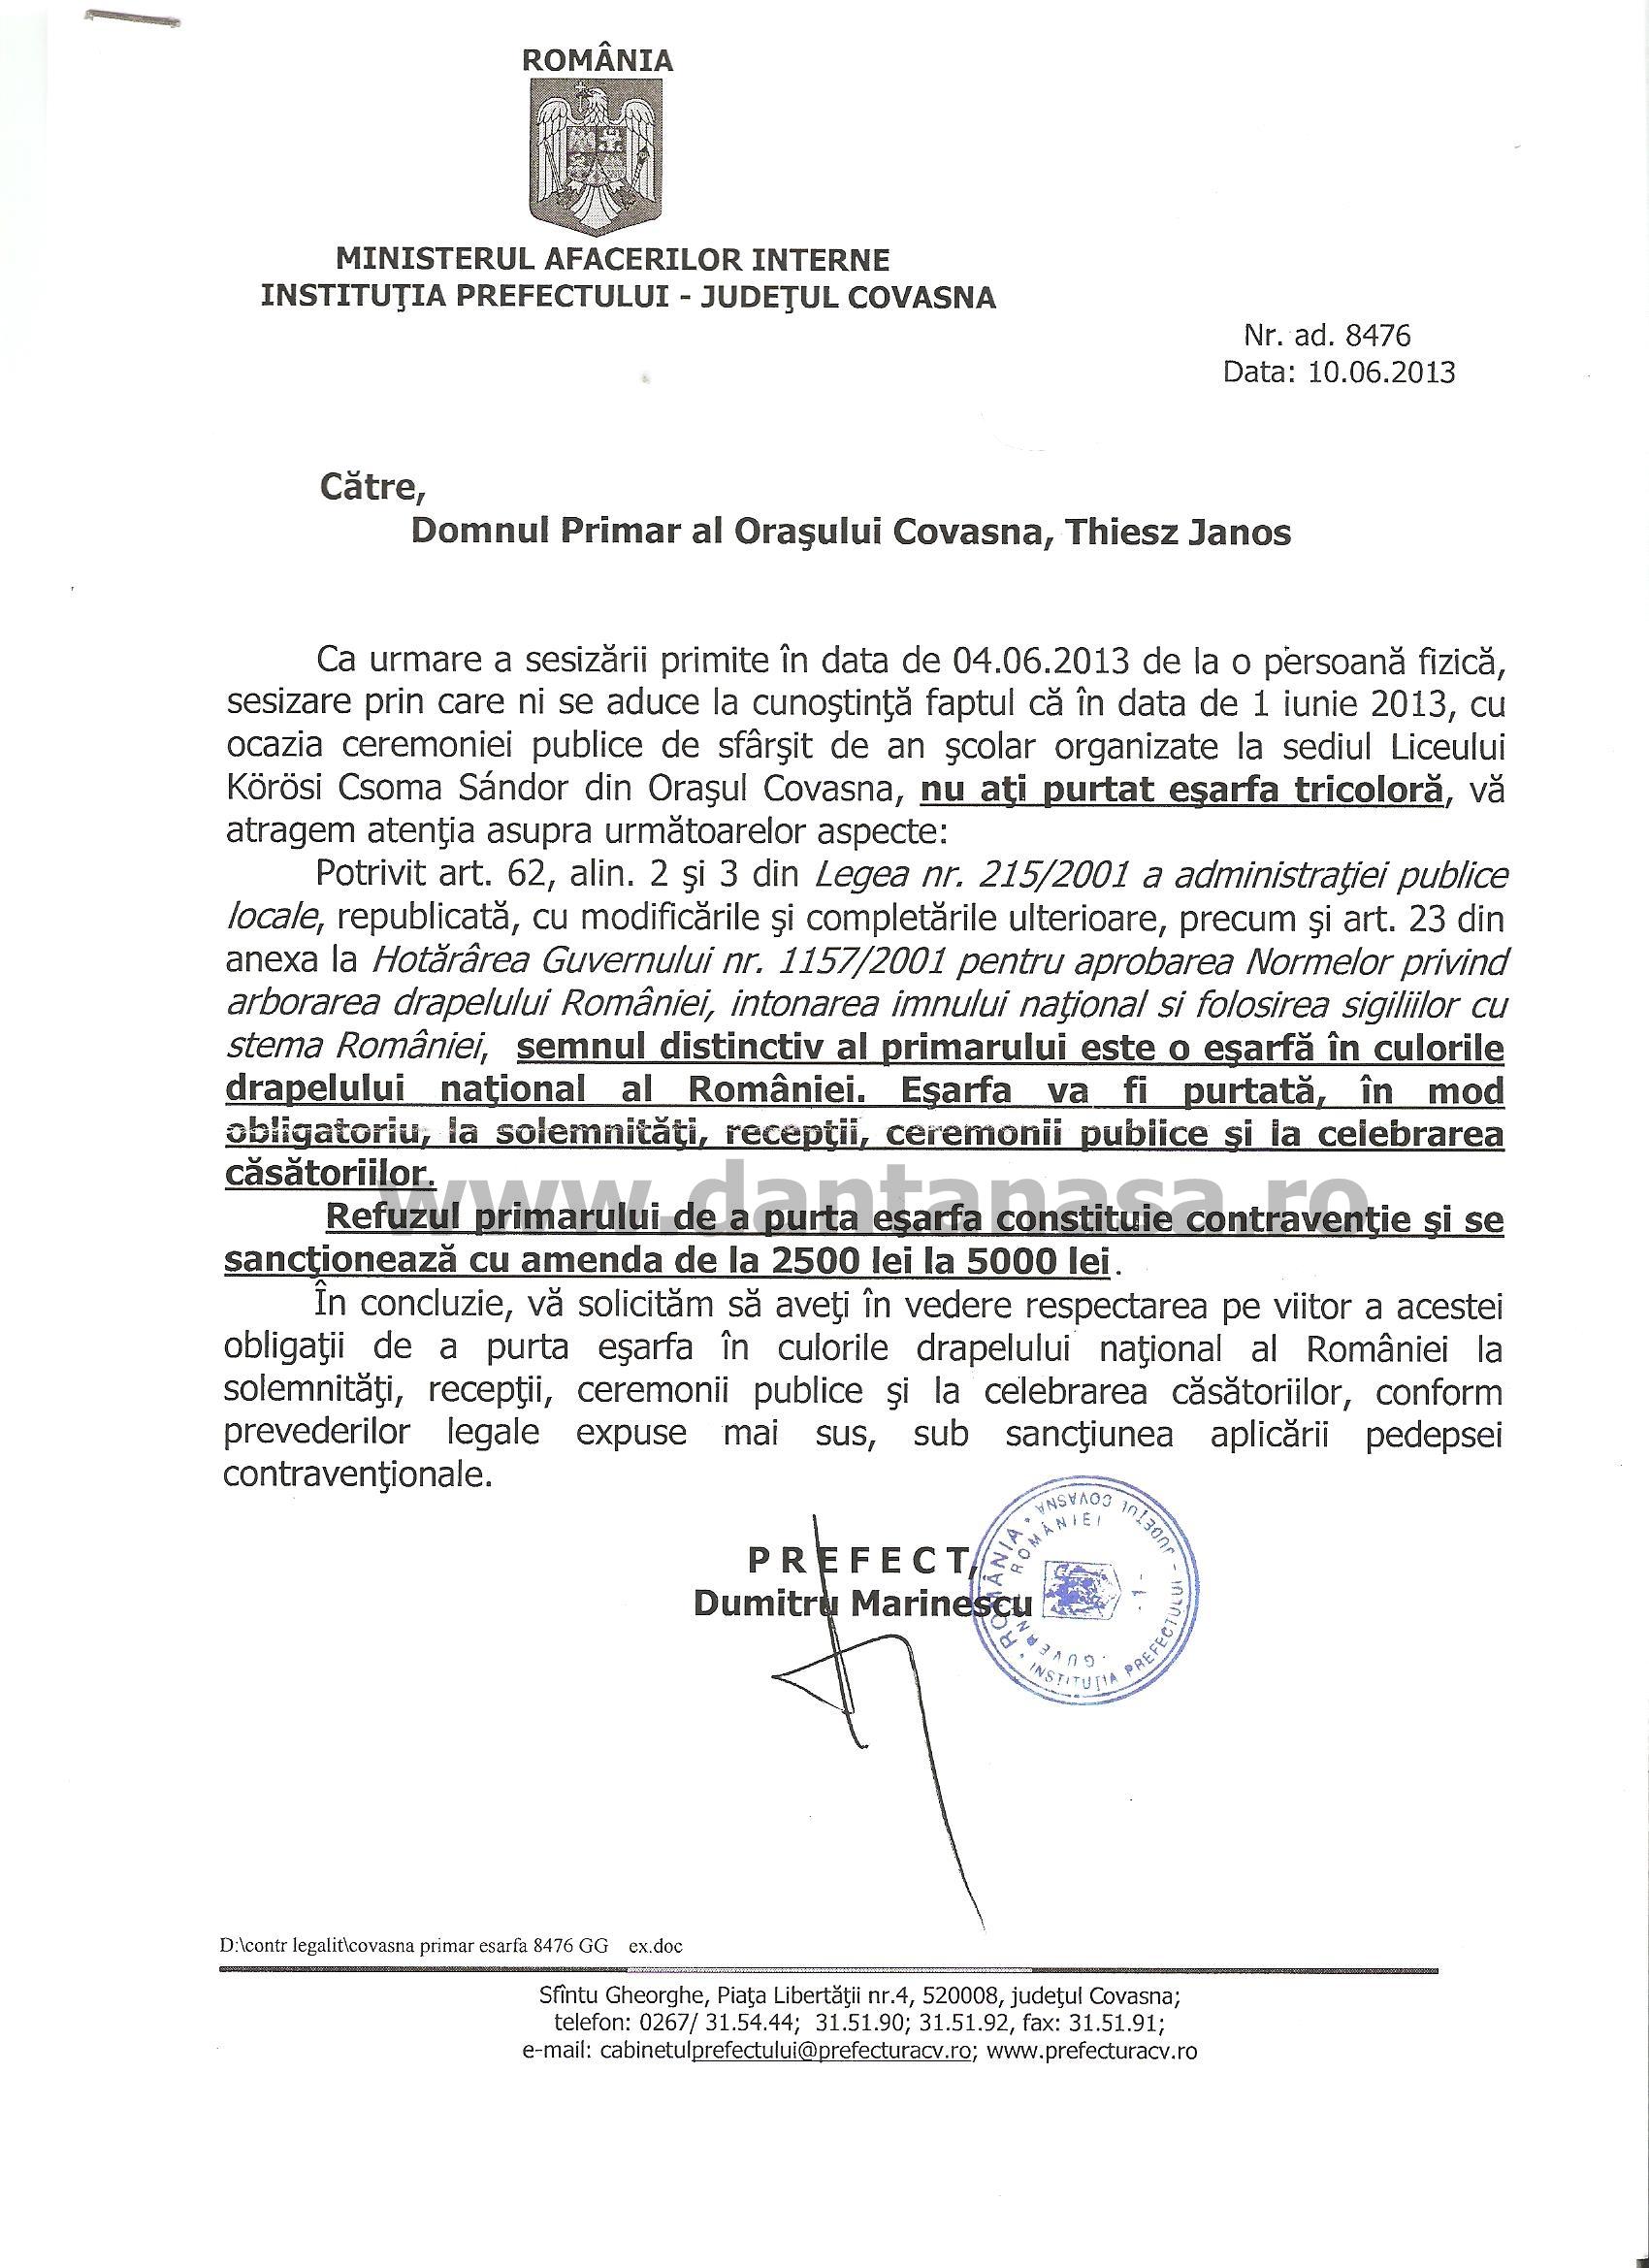 Prefect Covasna primar UDMR Covasna somatie esarfa tricolora Korosi